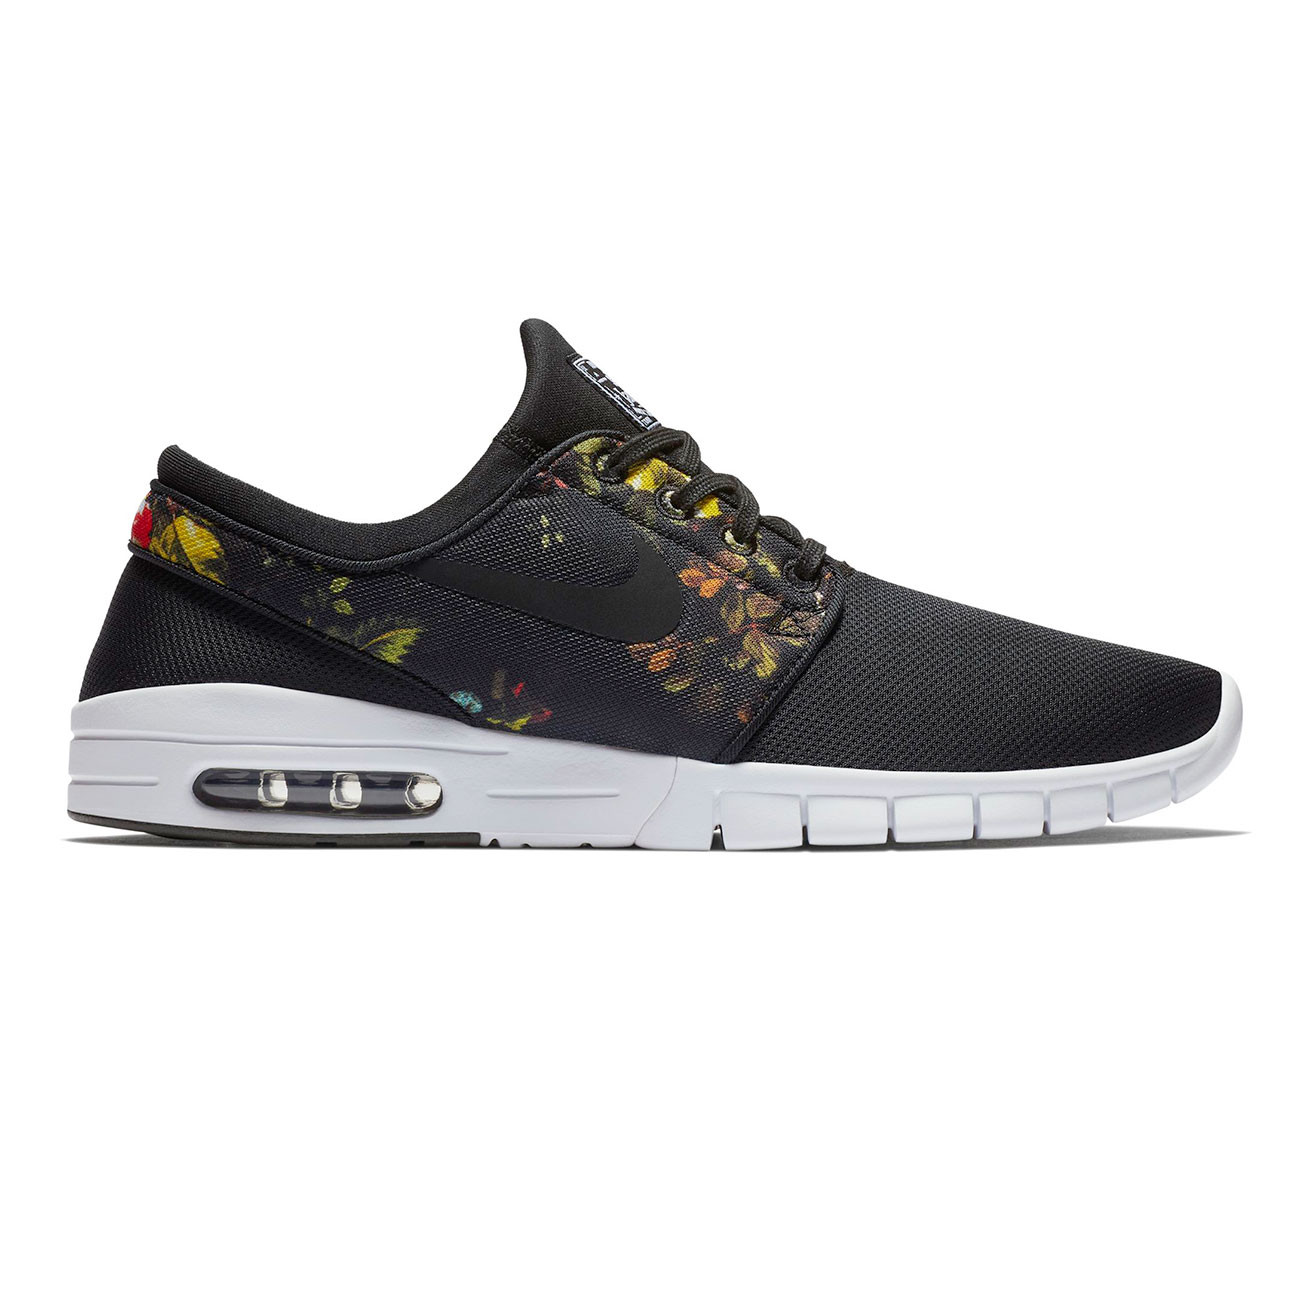 Sneakers Nike SB Stefan Janoski Max black black-multi-color ... d91edf245135